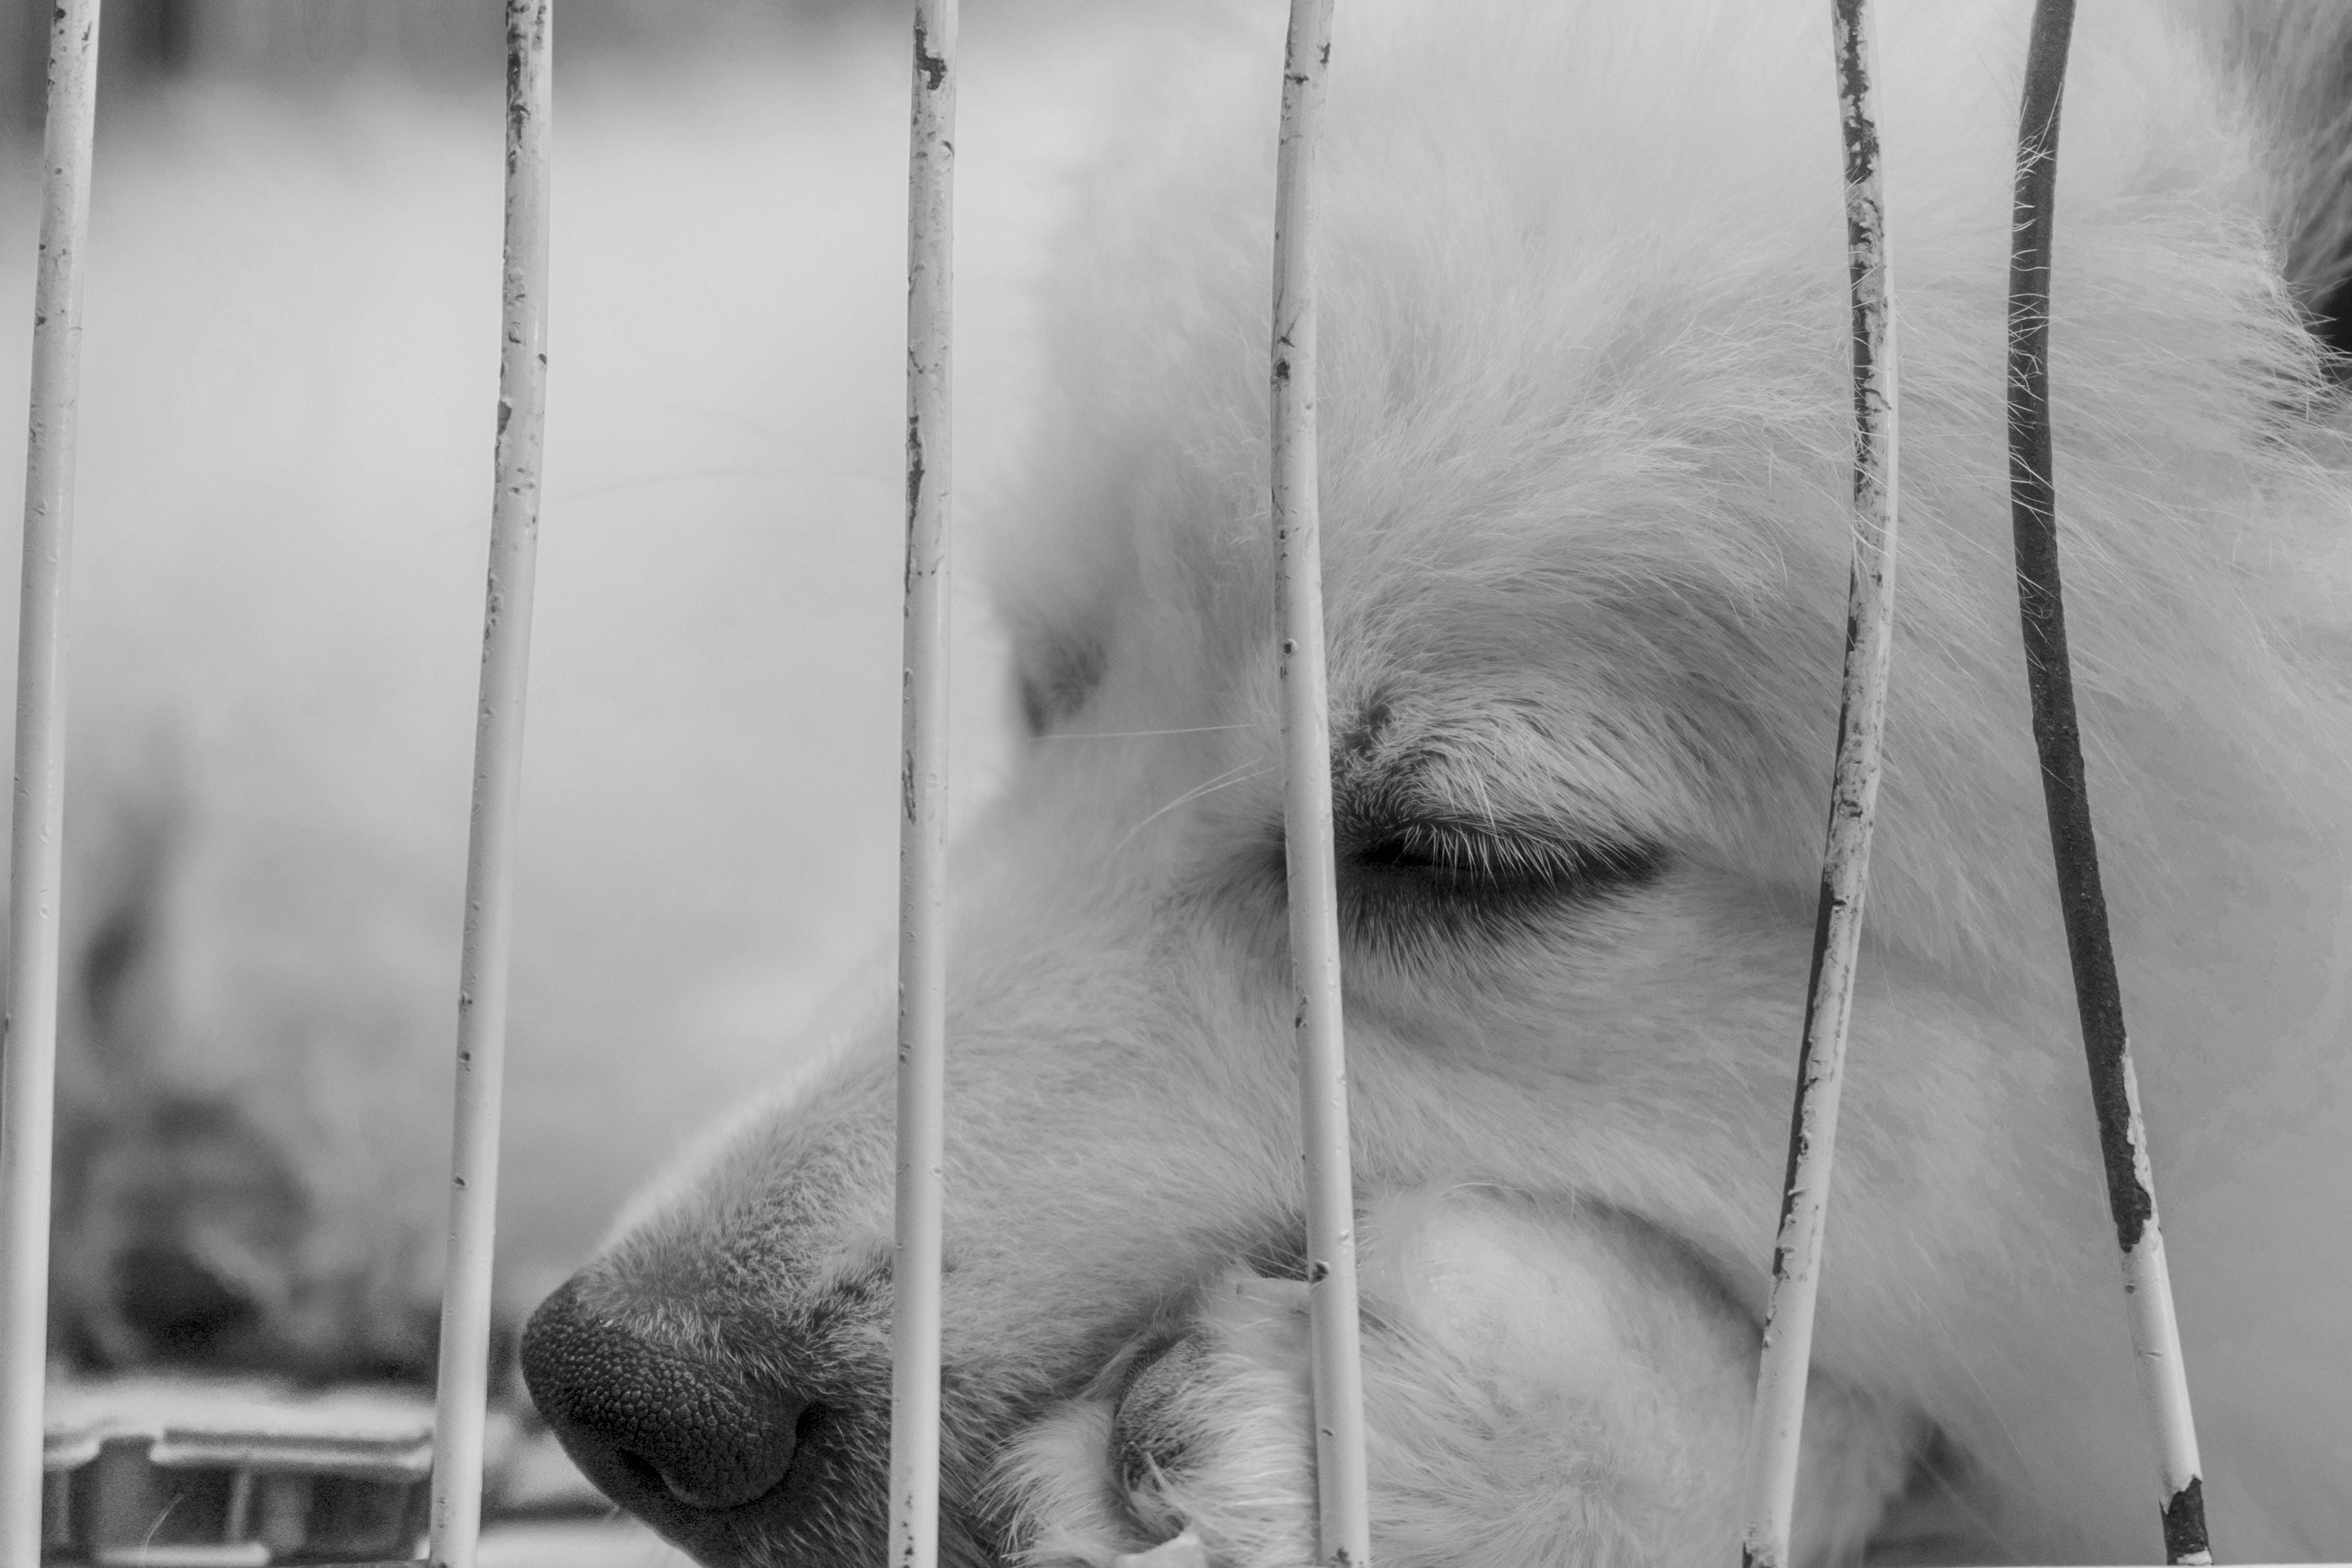 Free stock photo of animal, black and white, close up, dog